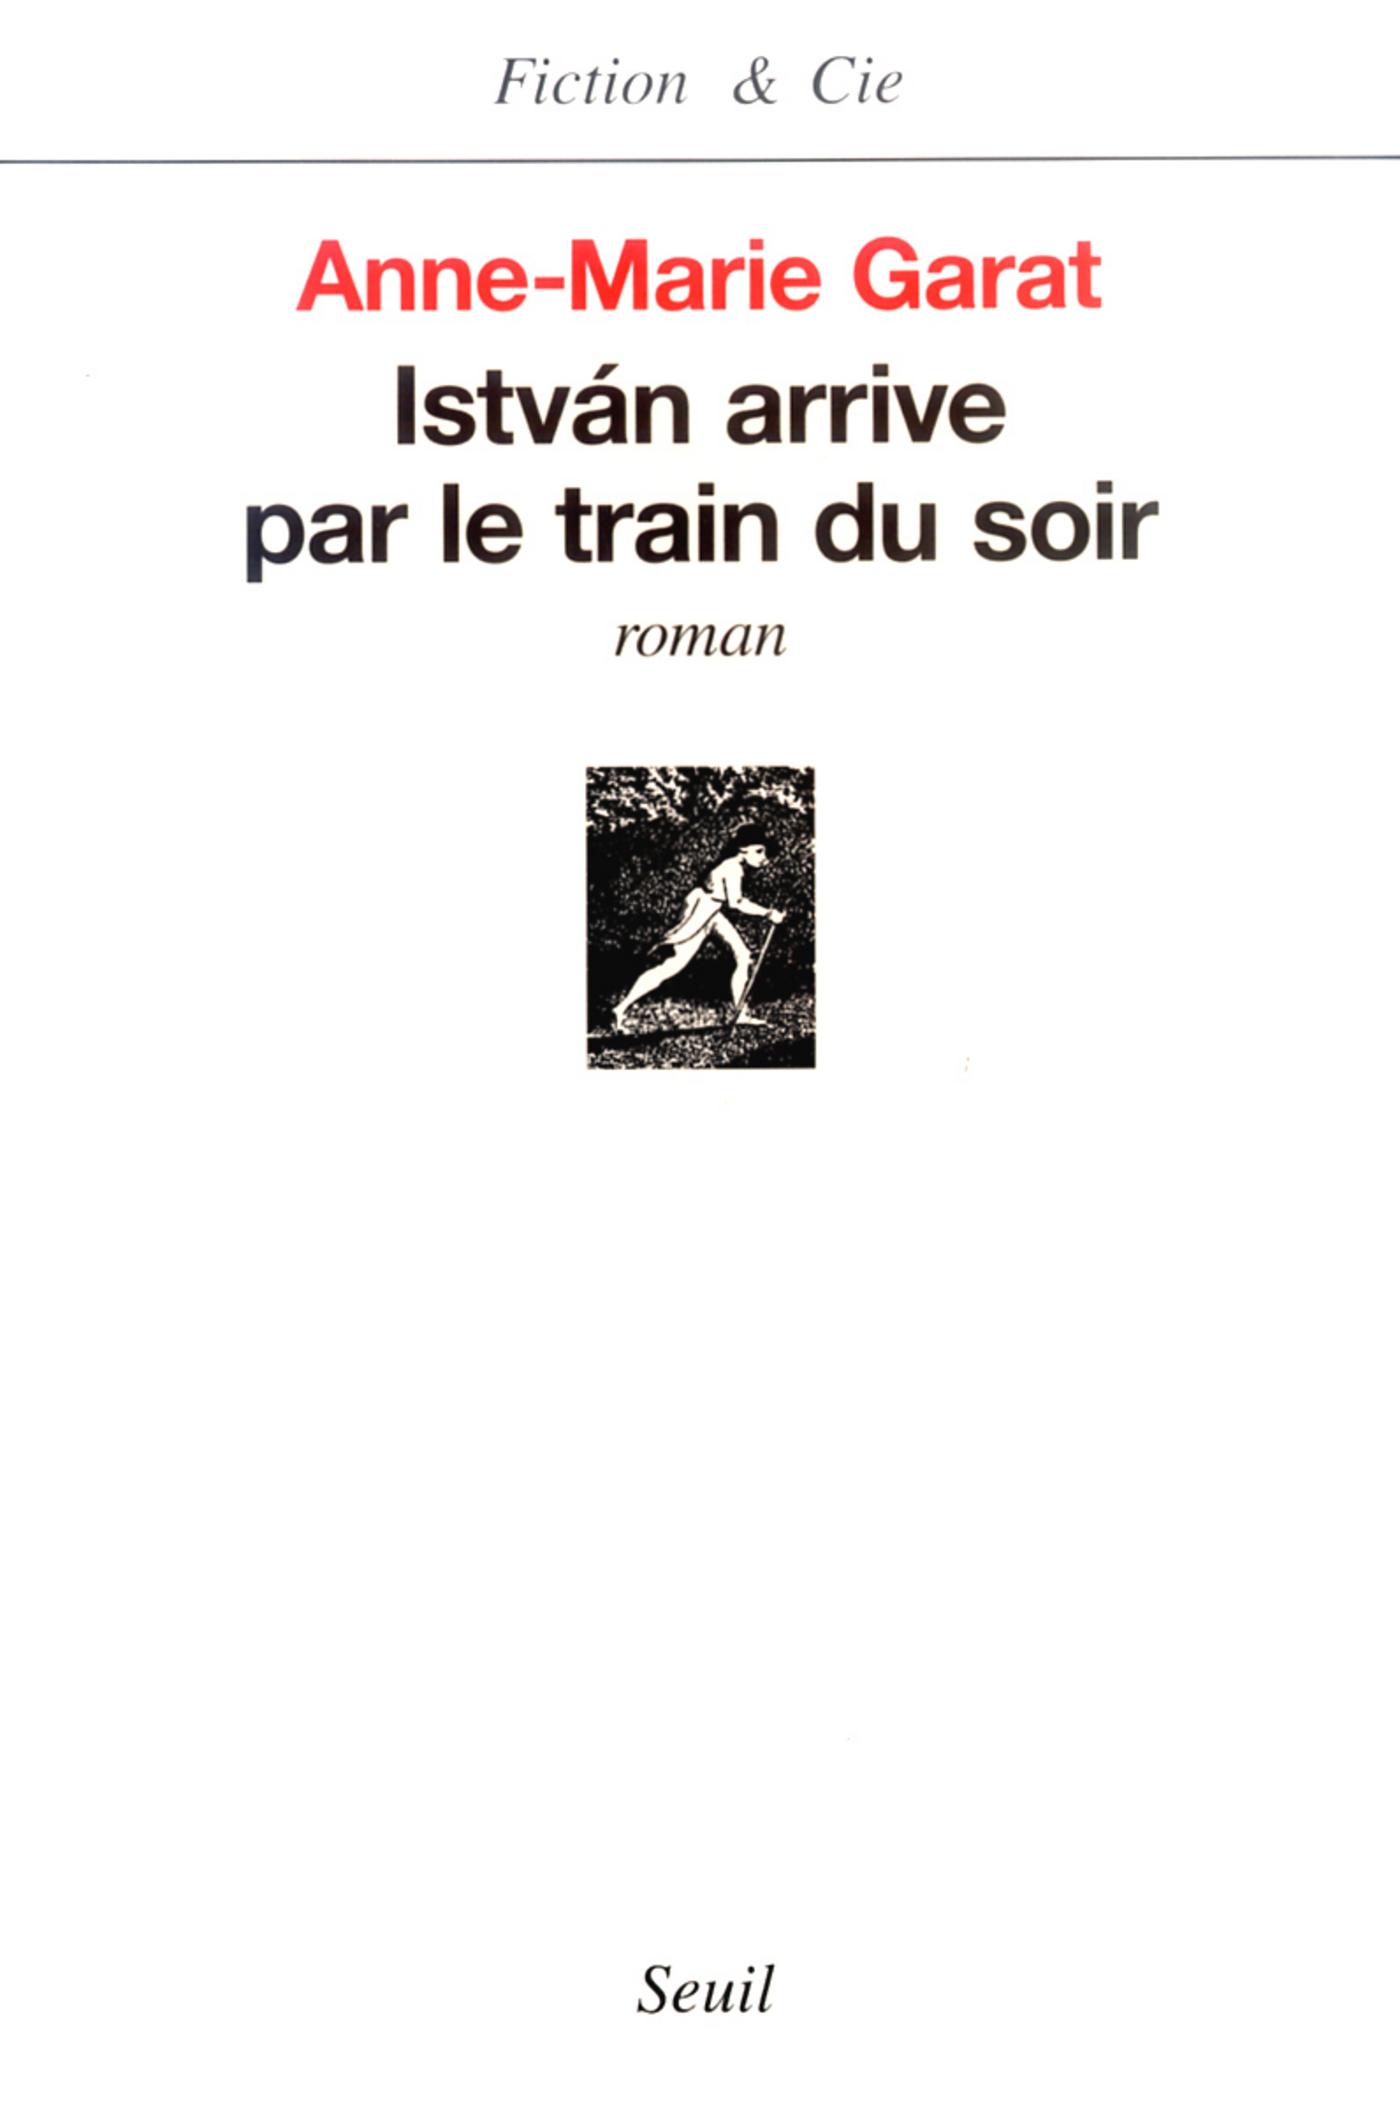 Istvàn arrive par le train du soir